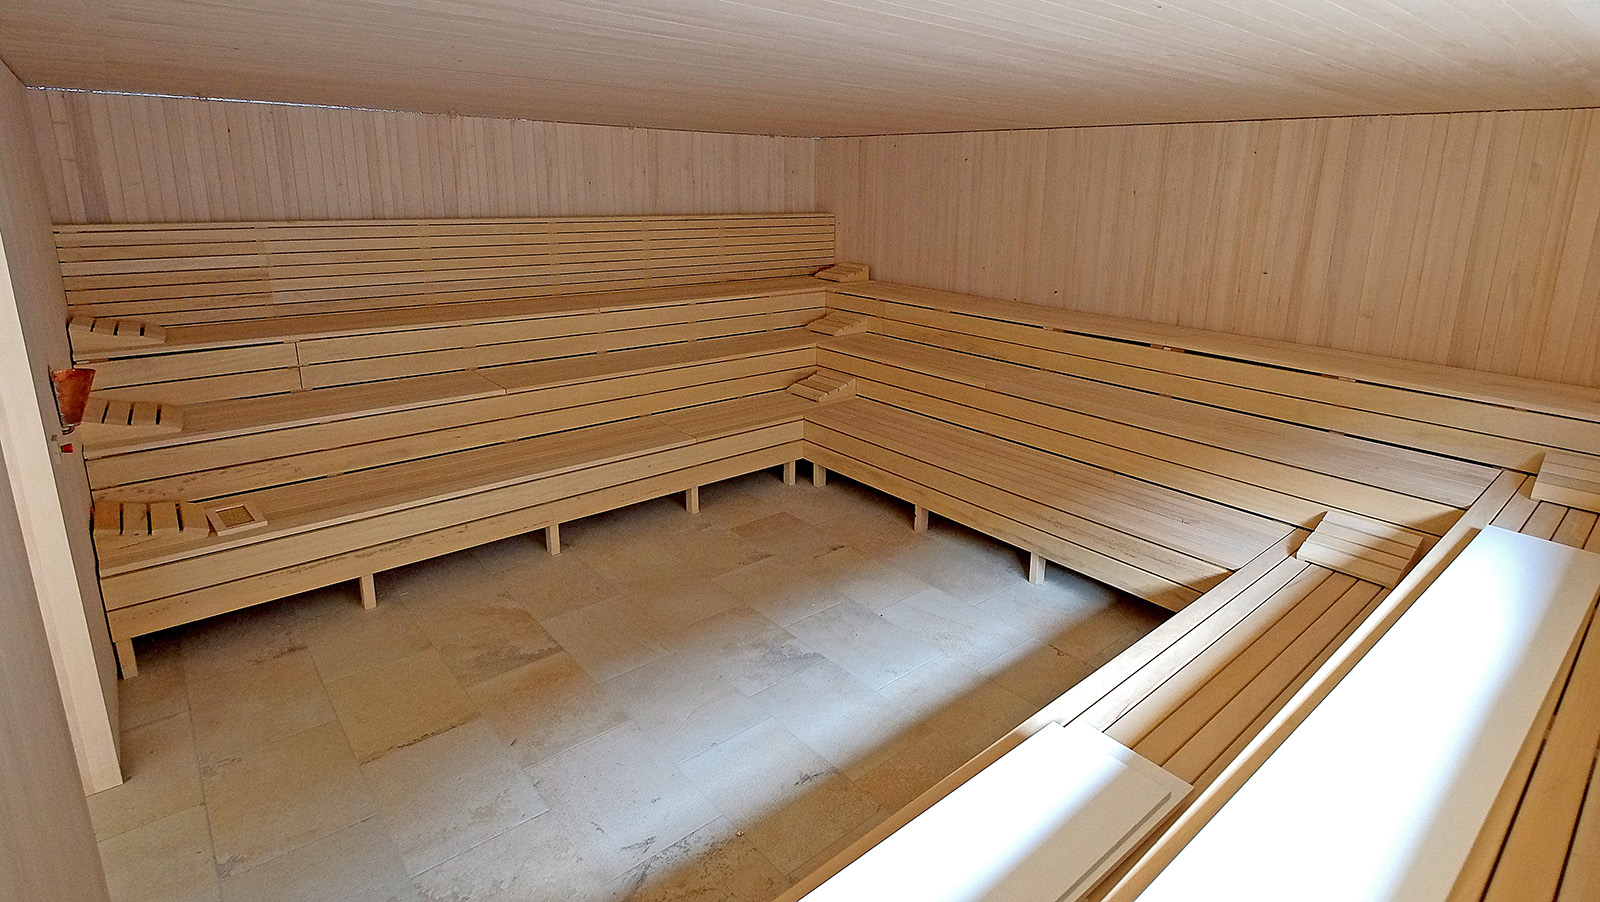 sauna_sneak_16x9